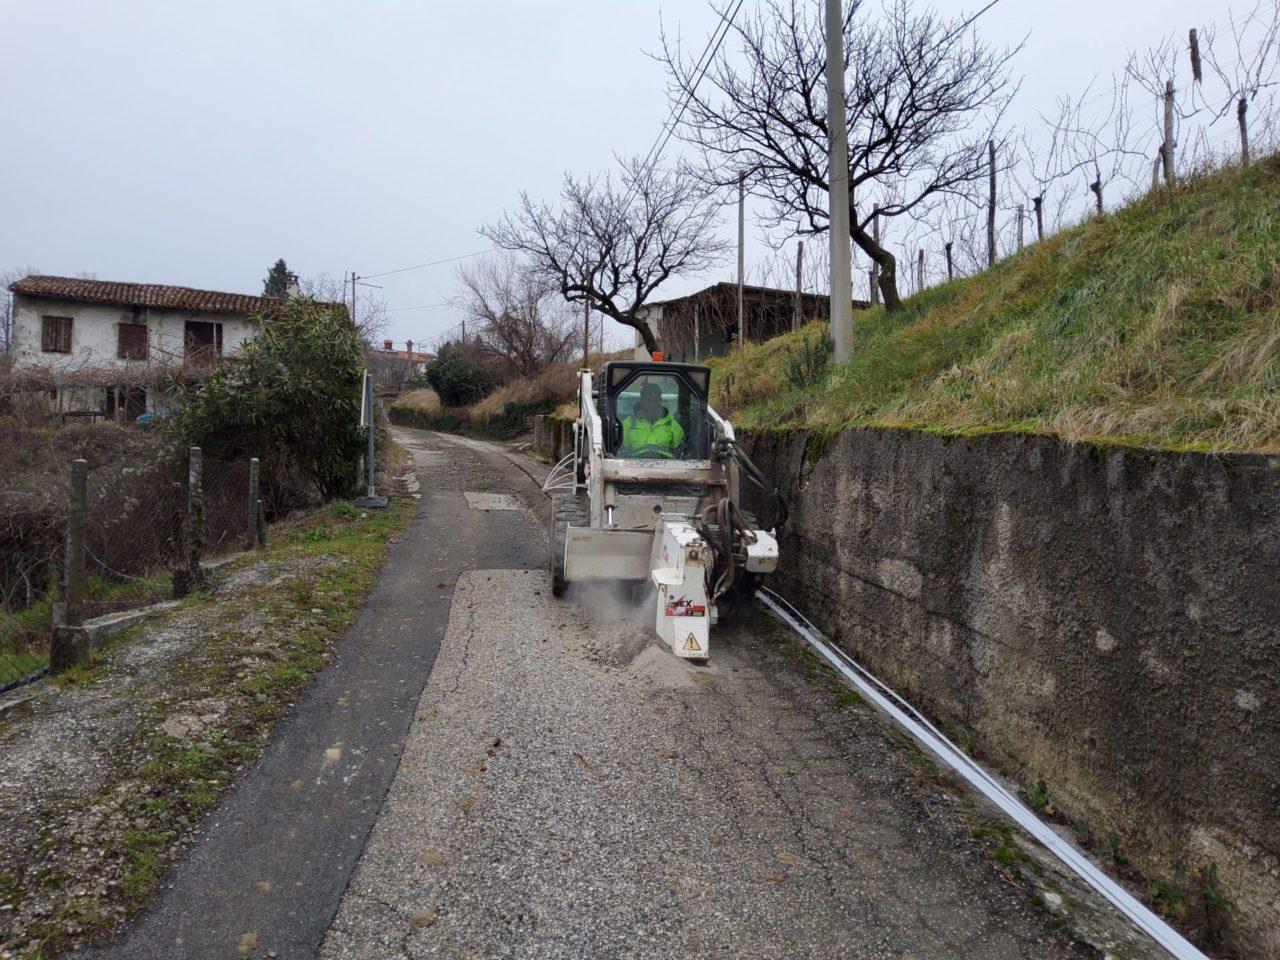 Gradnja omrežja RUNE v naselju Višnjevik